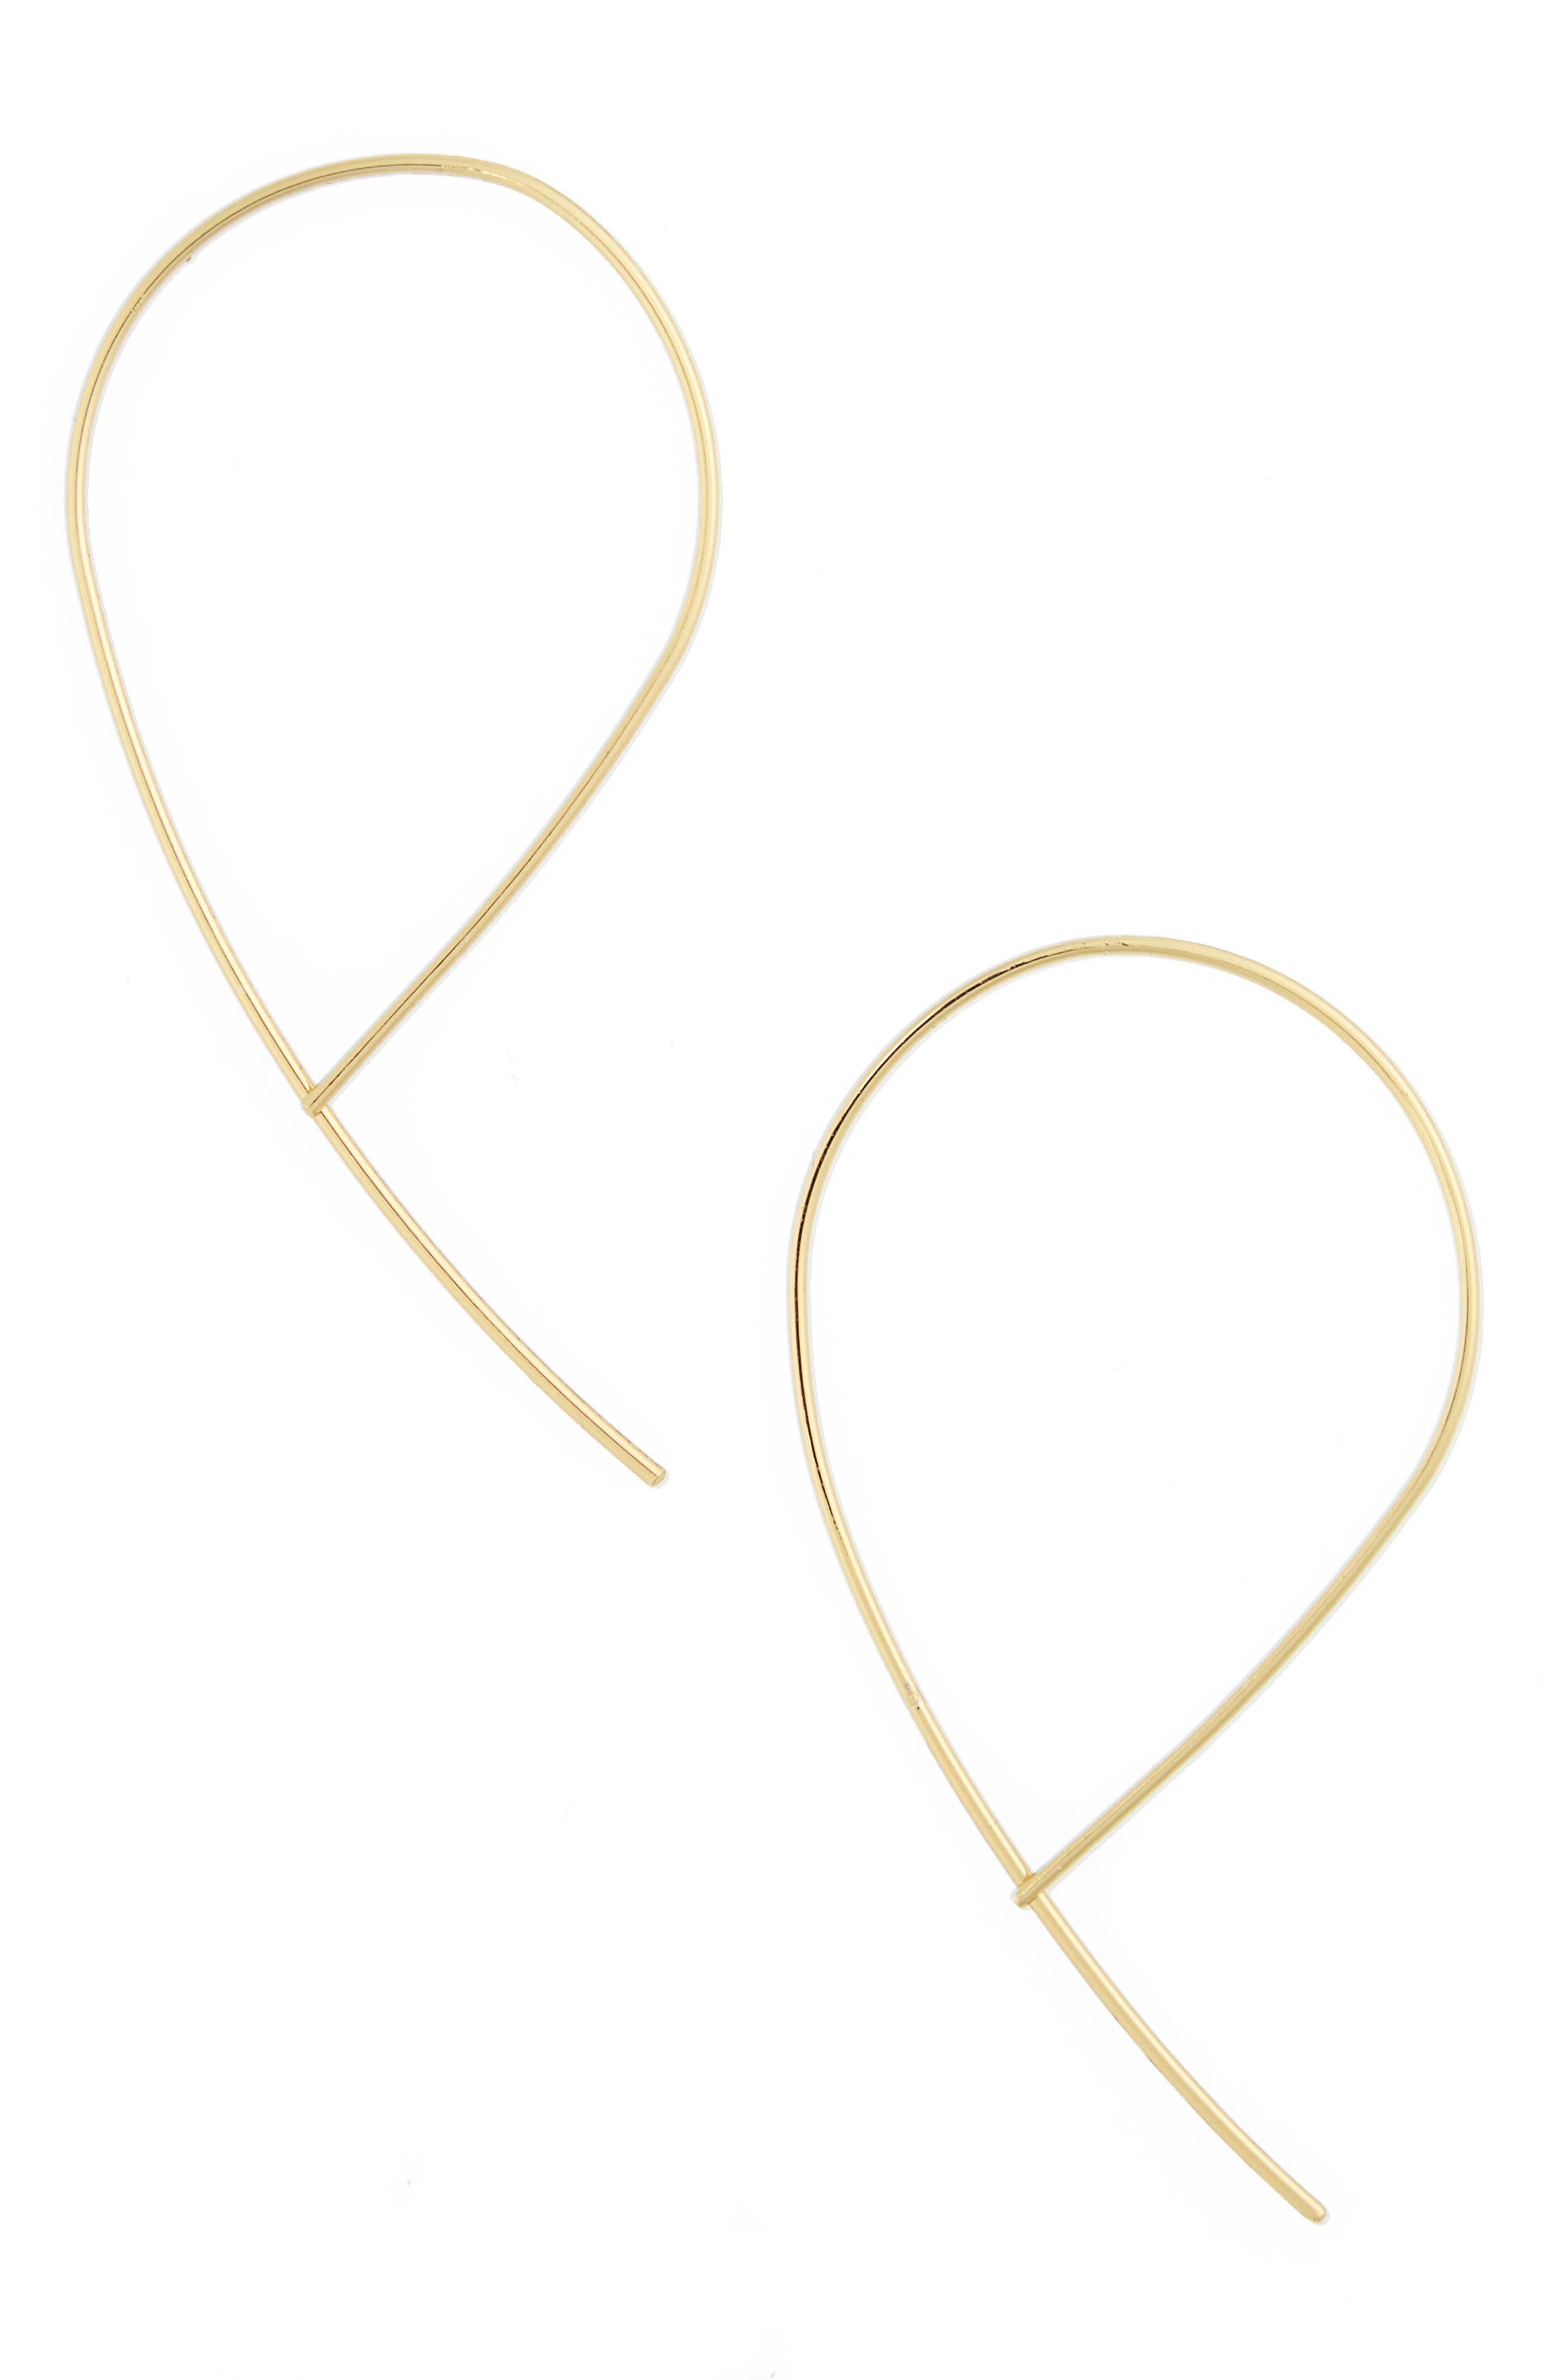 Arie Threader Earrings,                             Main thumbnail 1, color,                             GOLD